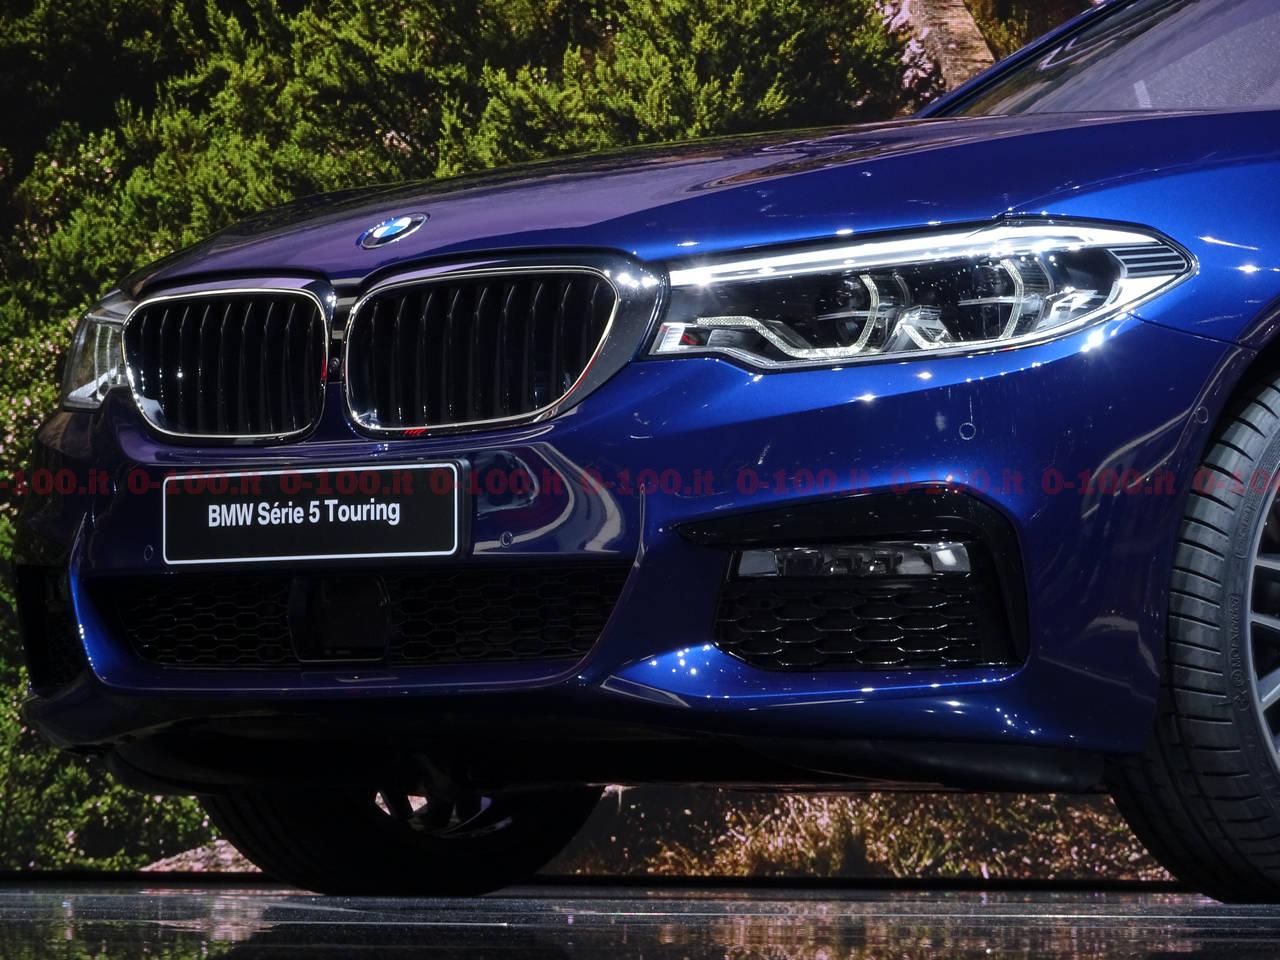 Ginevra-geneva-geneve-2017-BMW_Serie-5-Touring_0-100_5